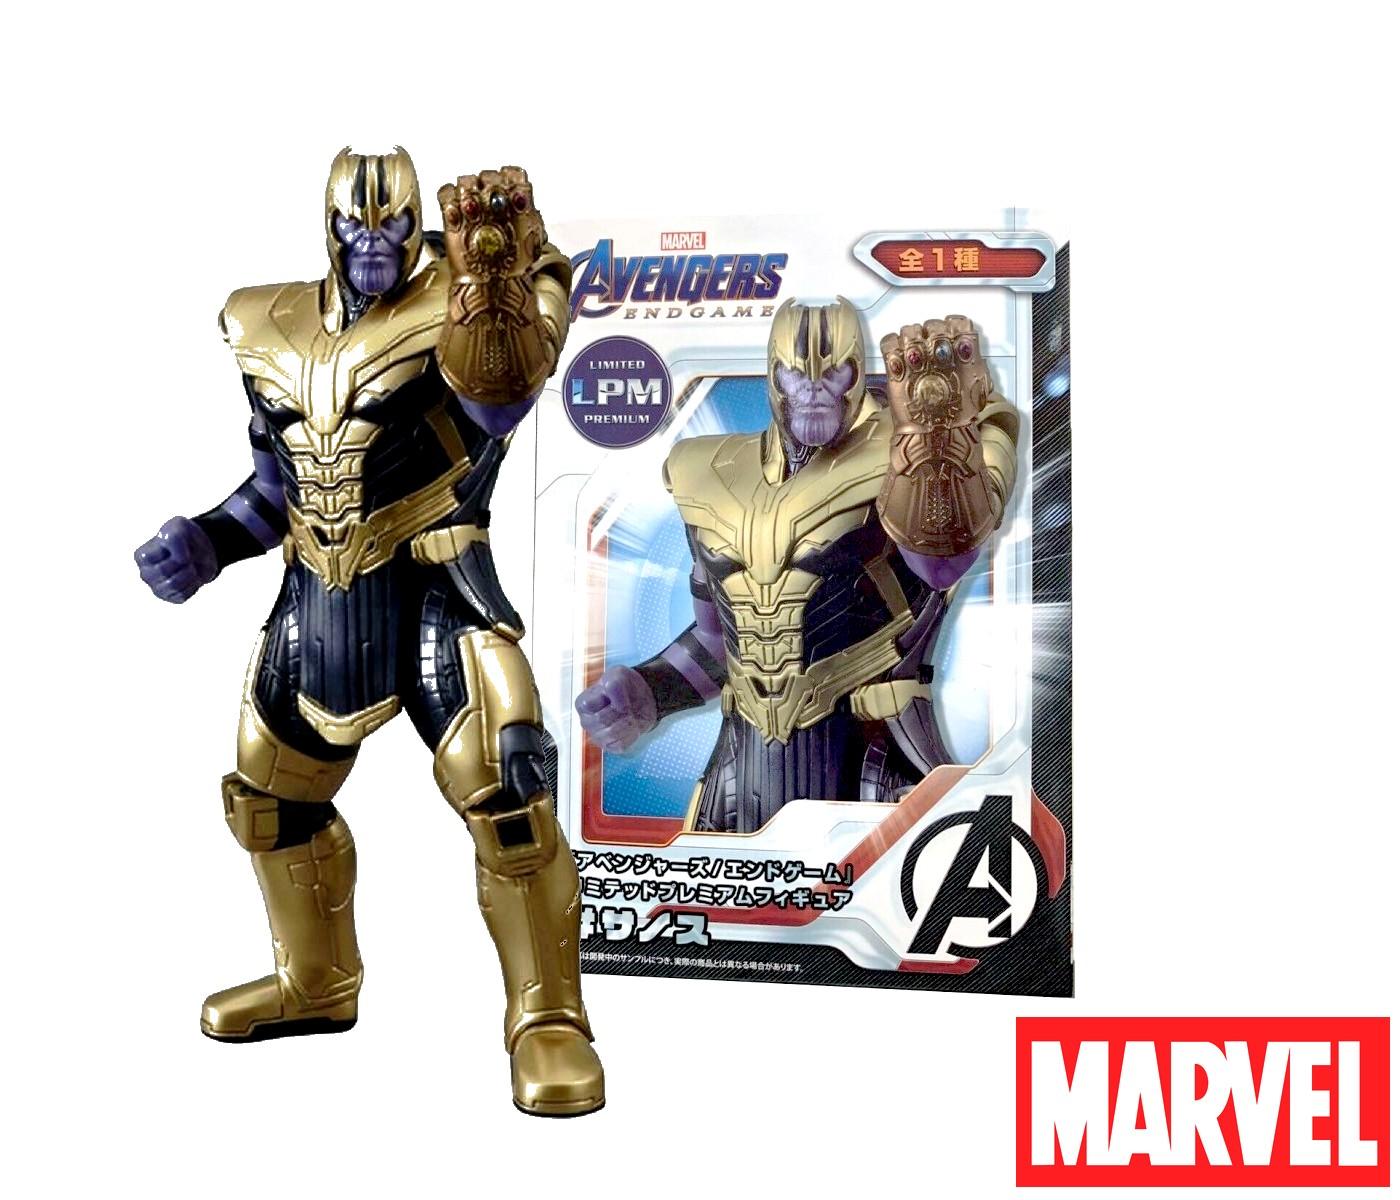 Avengers infinity war statue pvc lpm limited premium thanos 19 cm